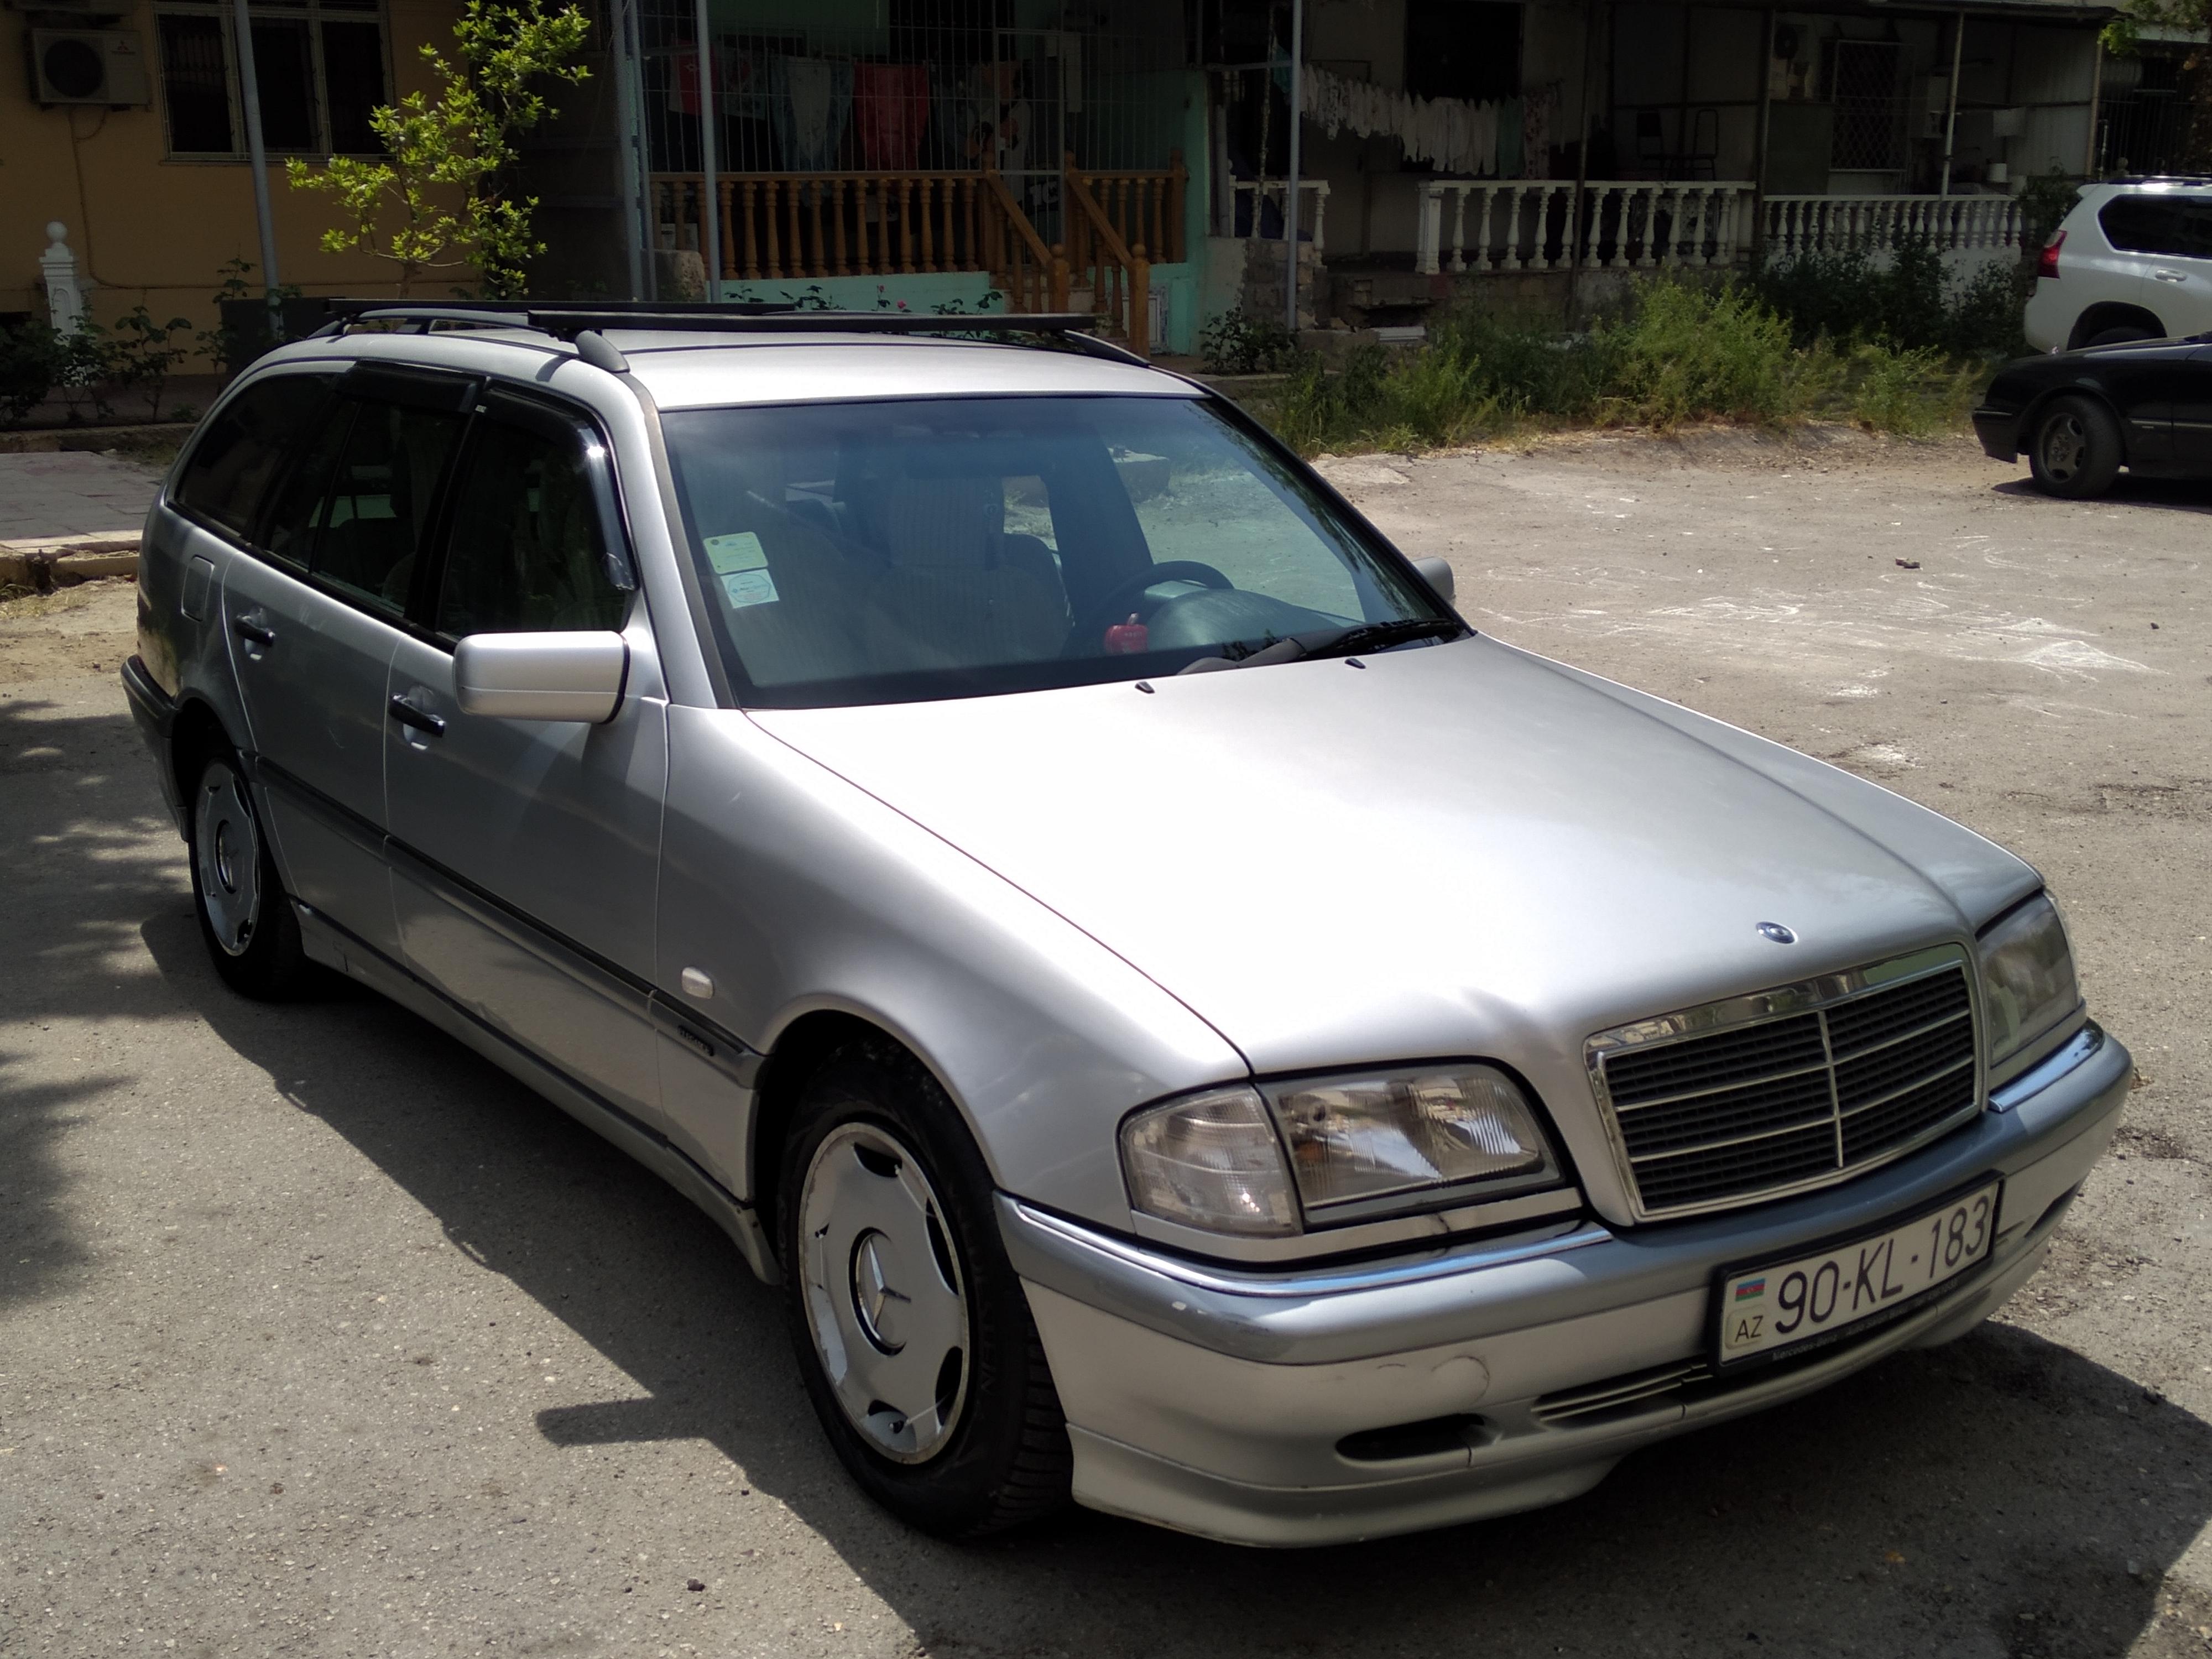 Mercedes-Benz C 240 2.4(lt) 1998 İkinci əl  $11000